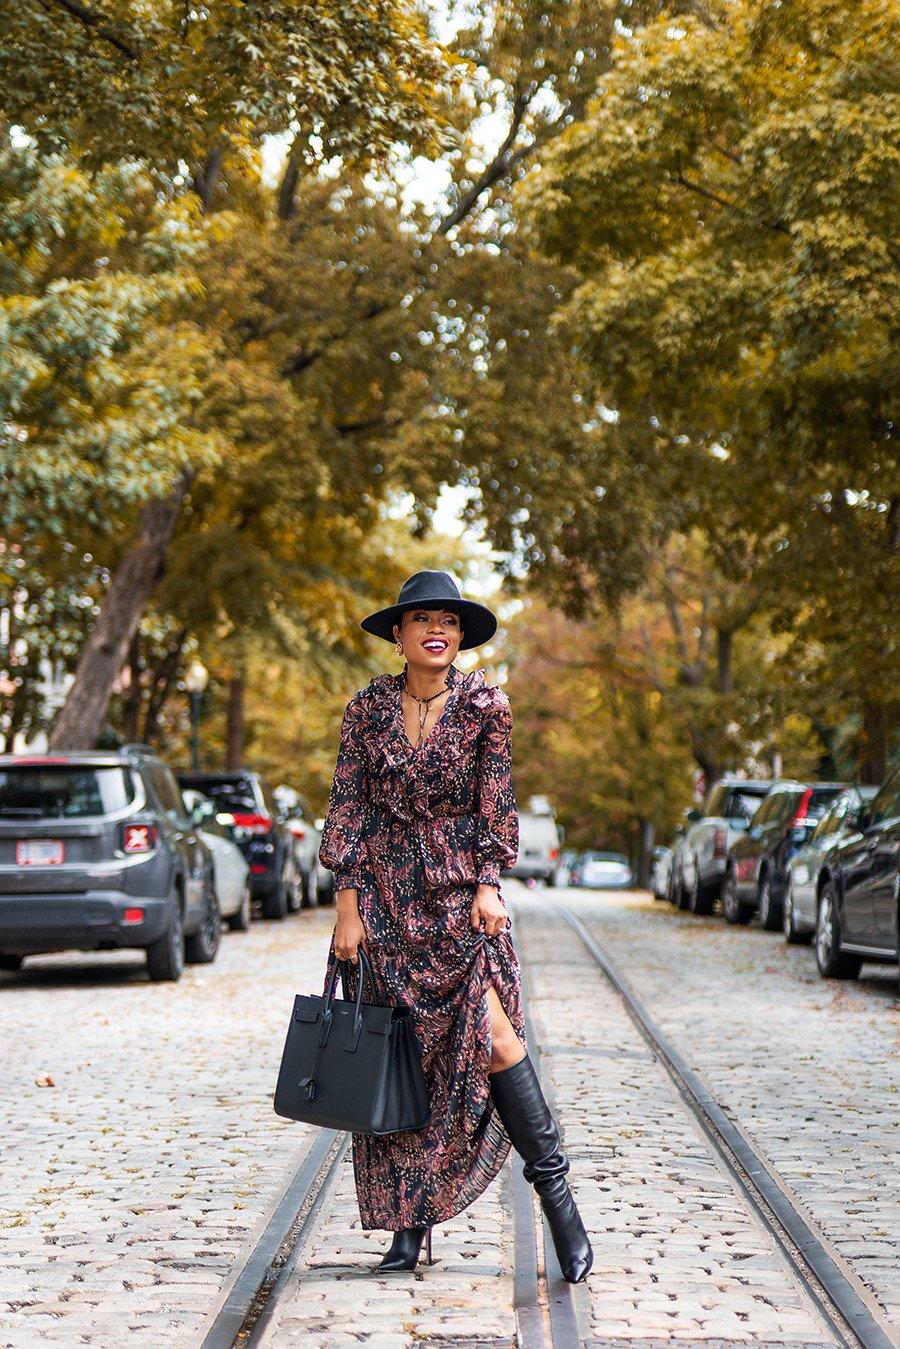 stella-adewunmi-of-jadore-fashion-blog-shares-mango-print-dress